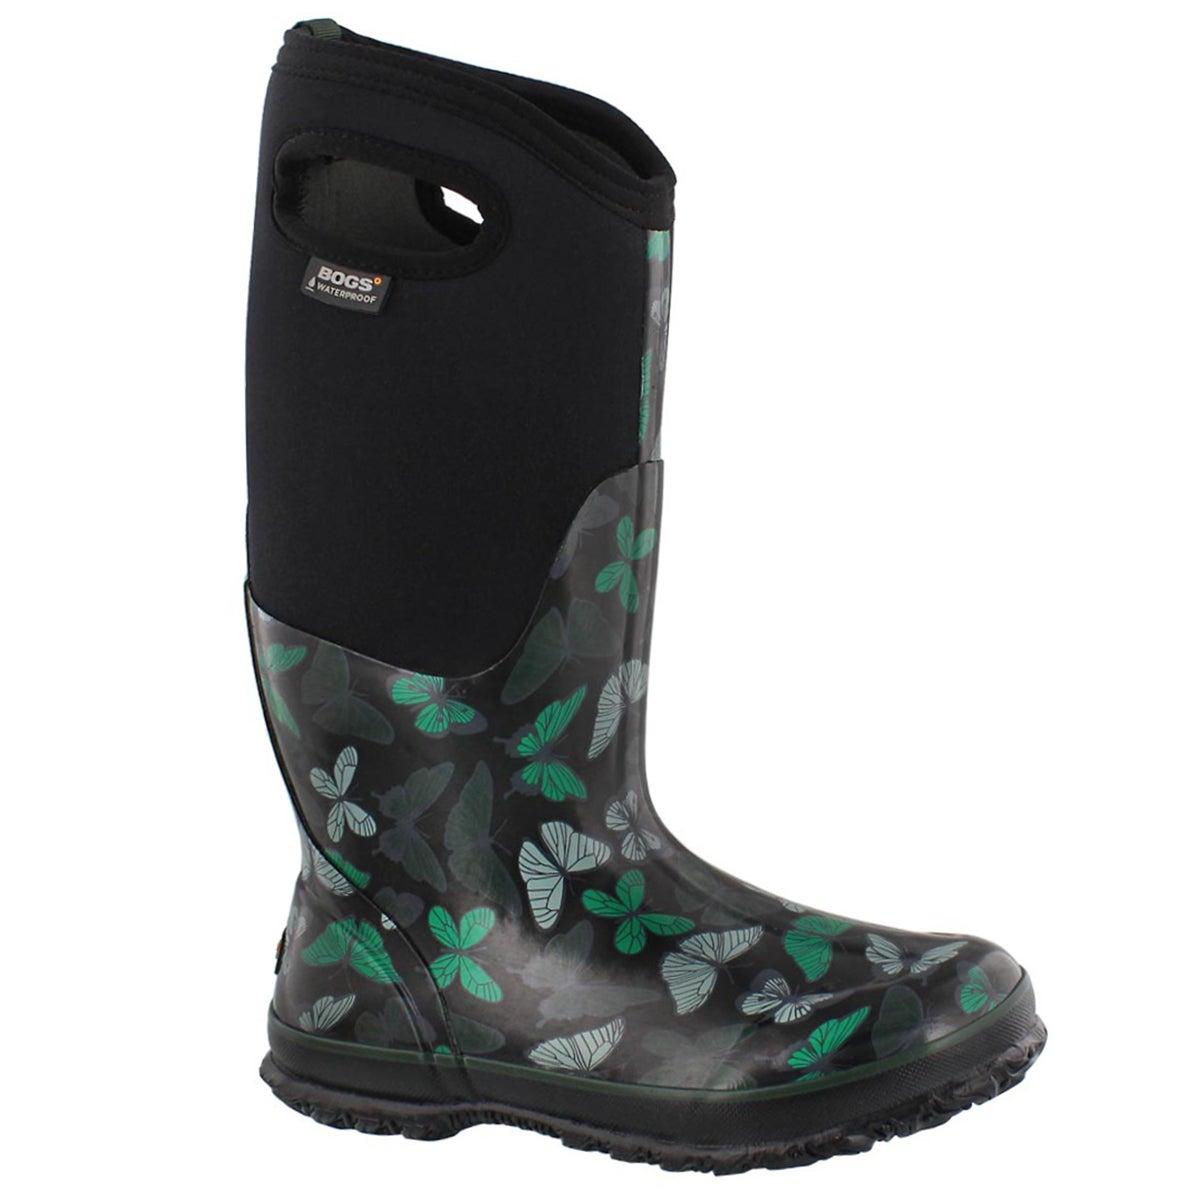 Women's CLASSIC BUTTERIES black waterproof boots